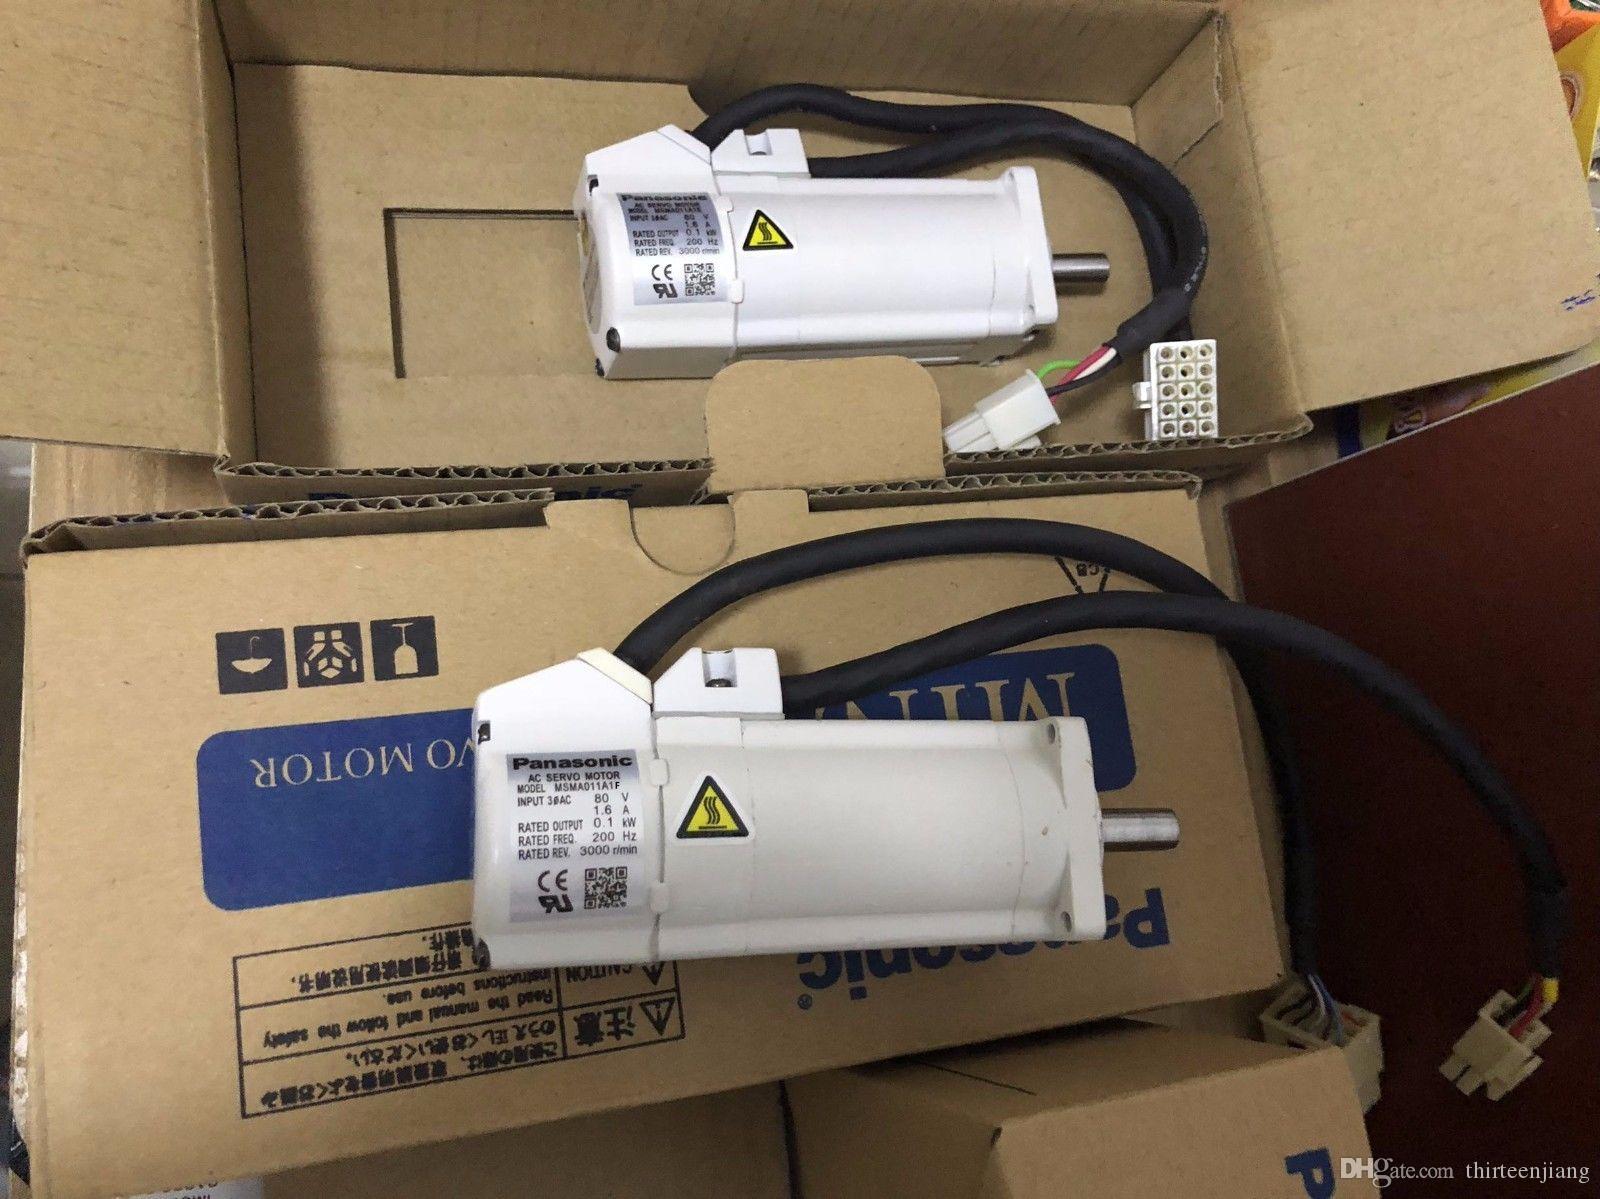 1 PC Panasonic Servo Motor MSMA011A1F New In Box Free Expedited Shipping